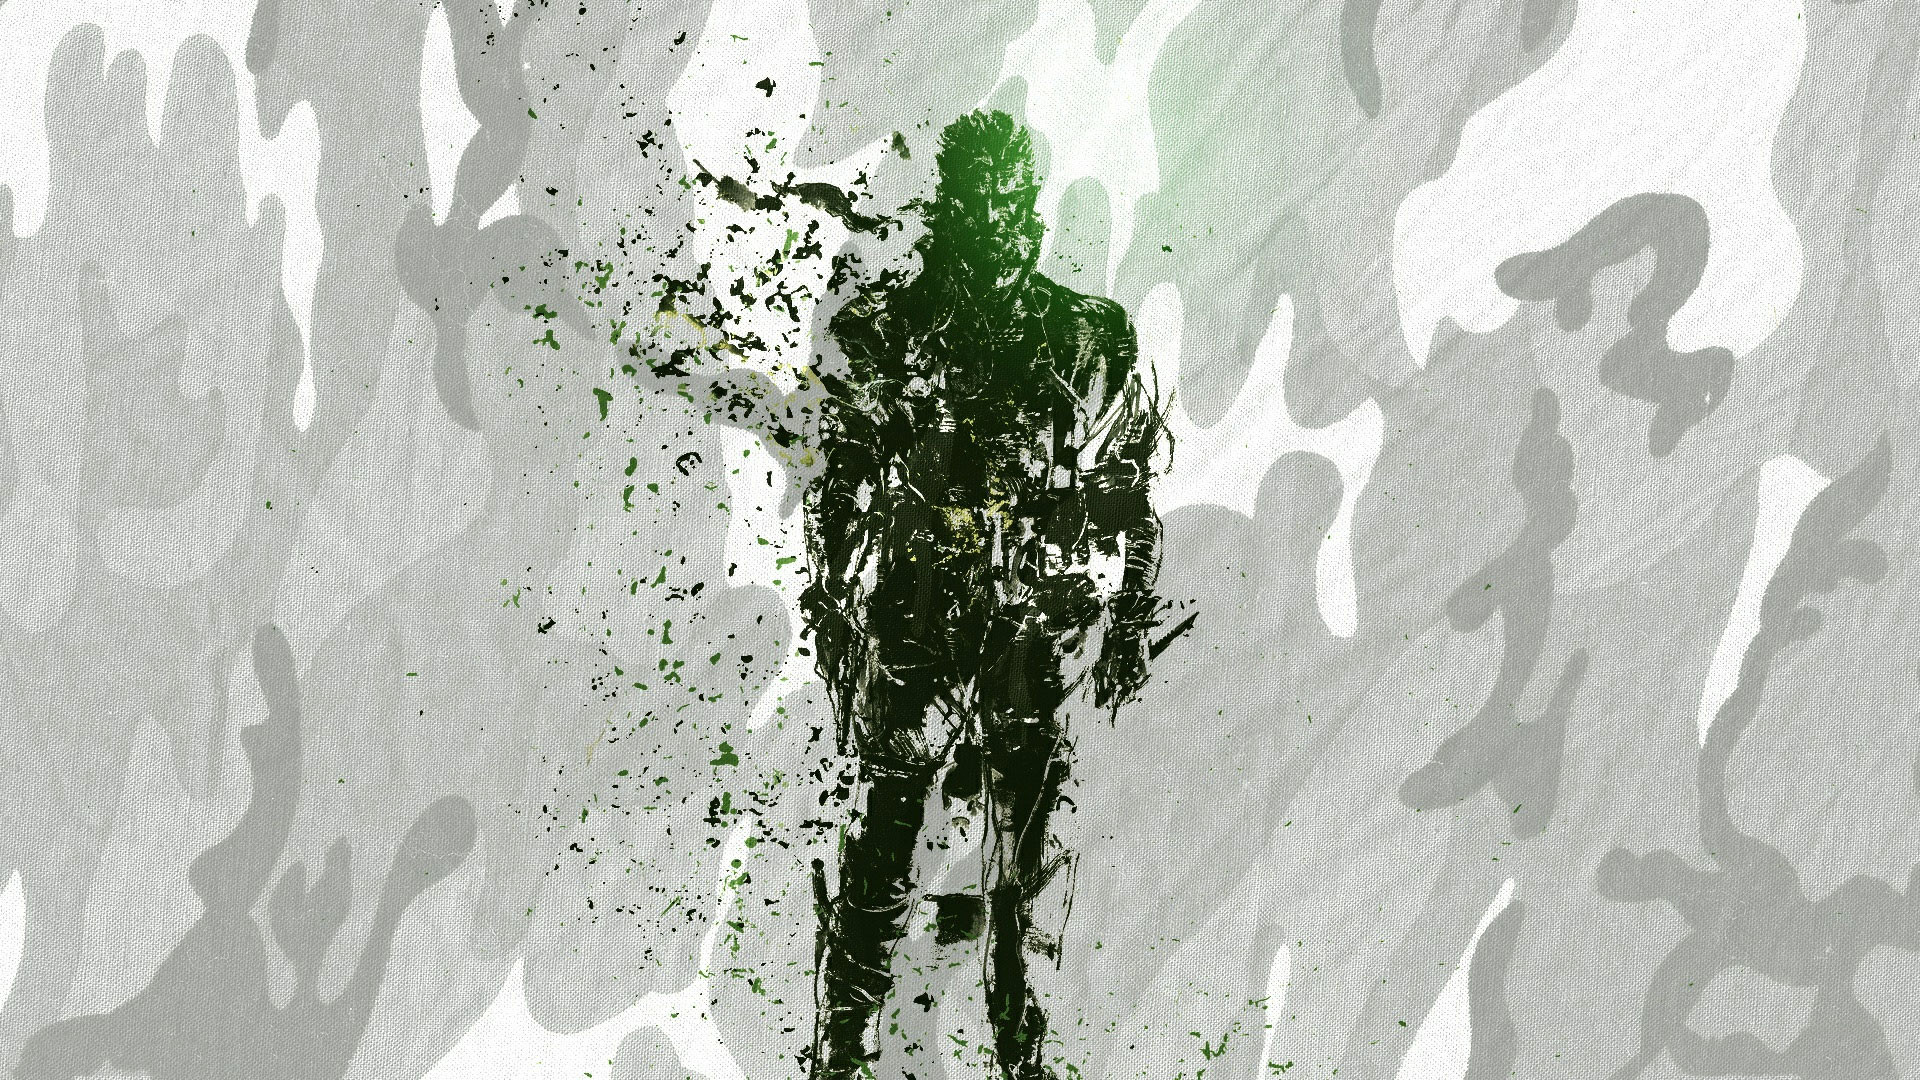 Metal Gear Solid, Big Boss, Metal Gear Solid : Snake Eater, The Metal Gear  Solid Snake Eater Wallpapers Wallpapers)